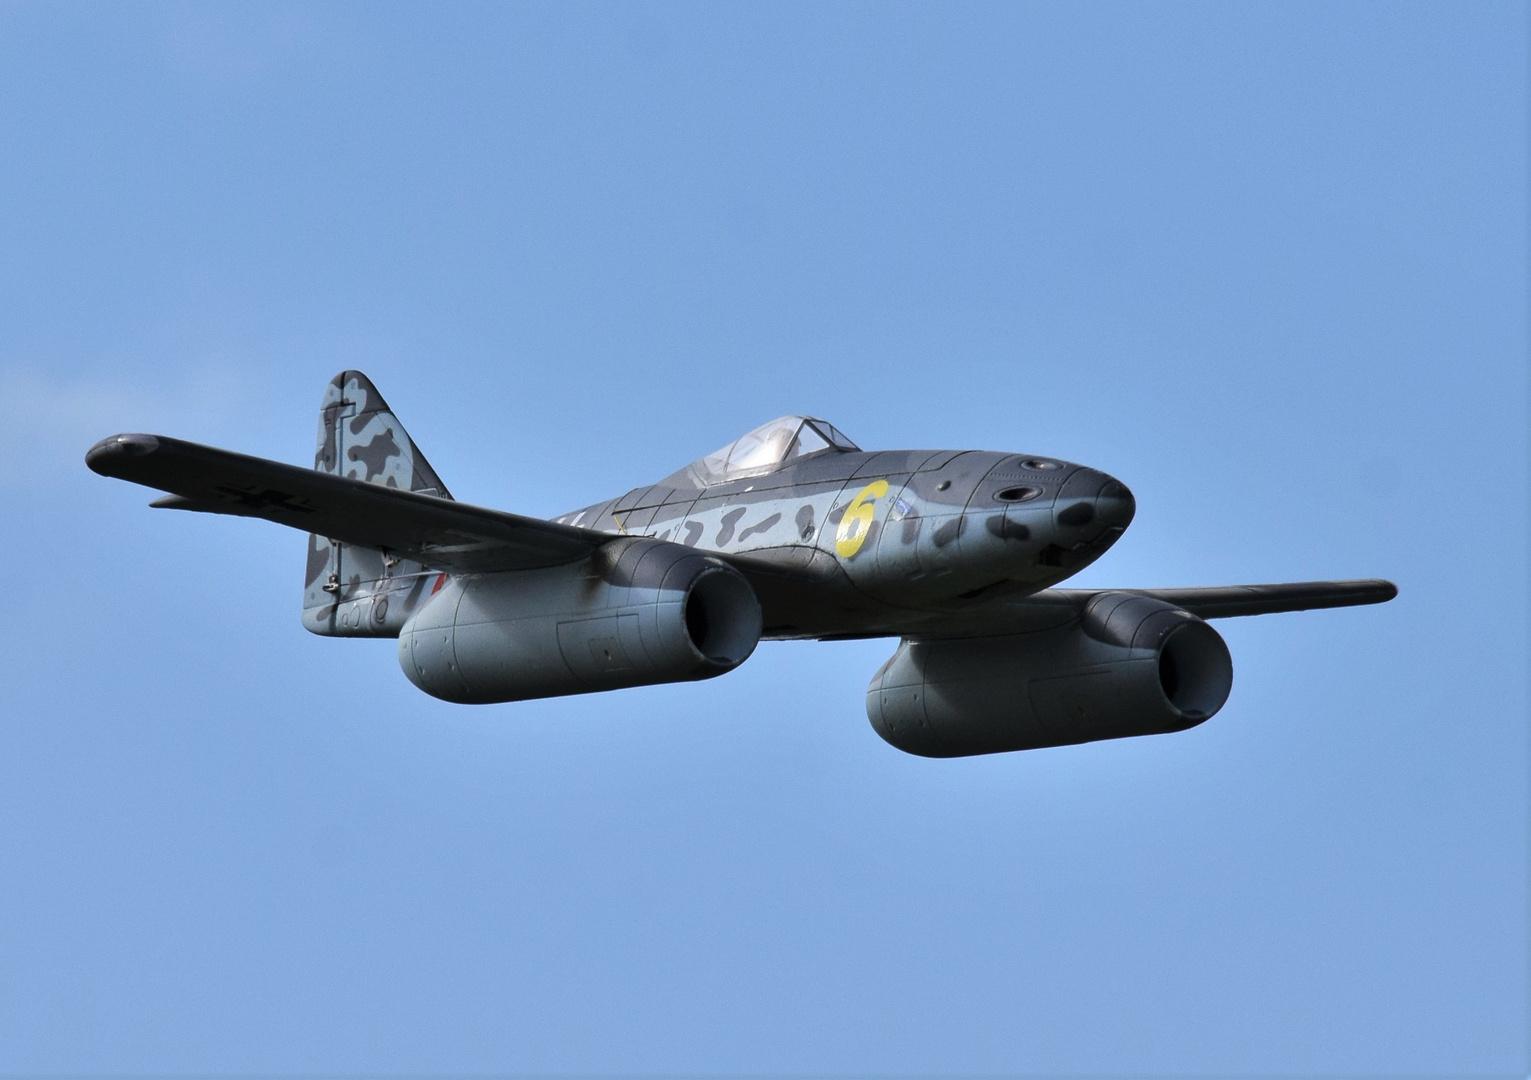 Me 262 (Schwalbe )